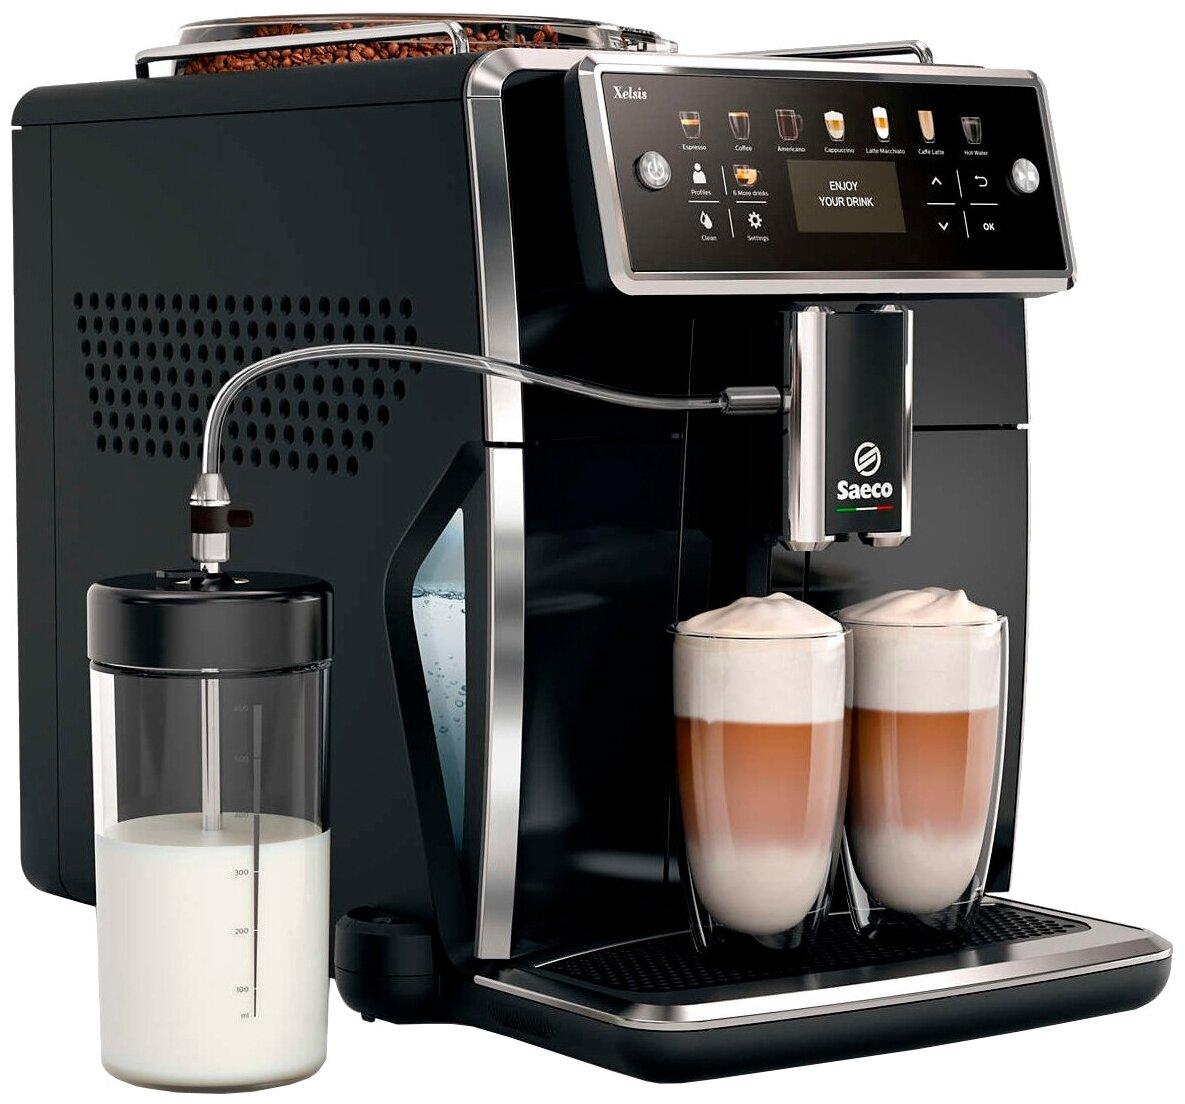 Saeco SM7580 Xelsis - тип напитка: капучино, эспрессо, латте макиато, лунго, американо, ристретто